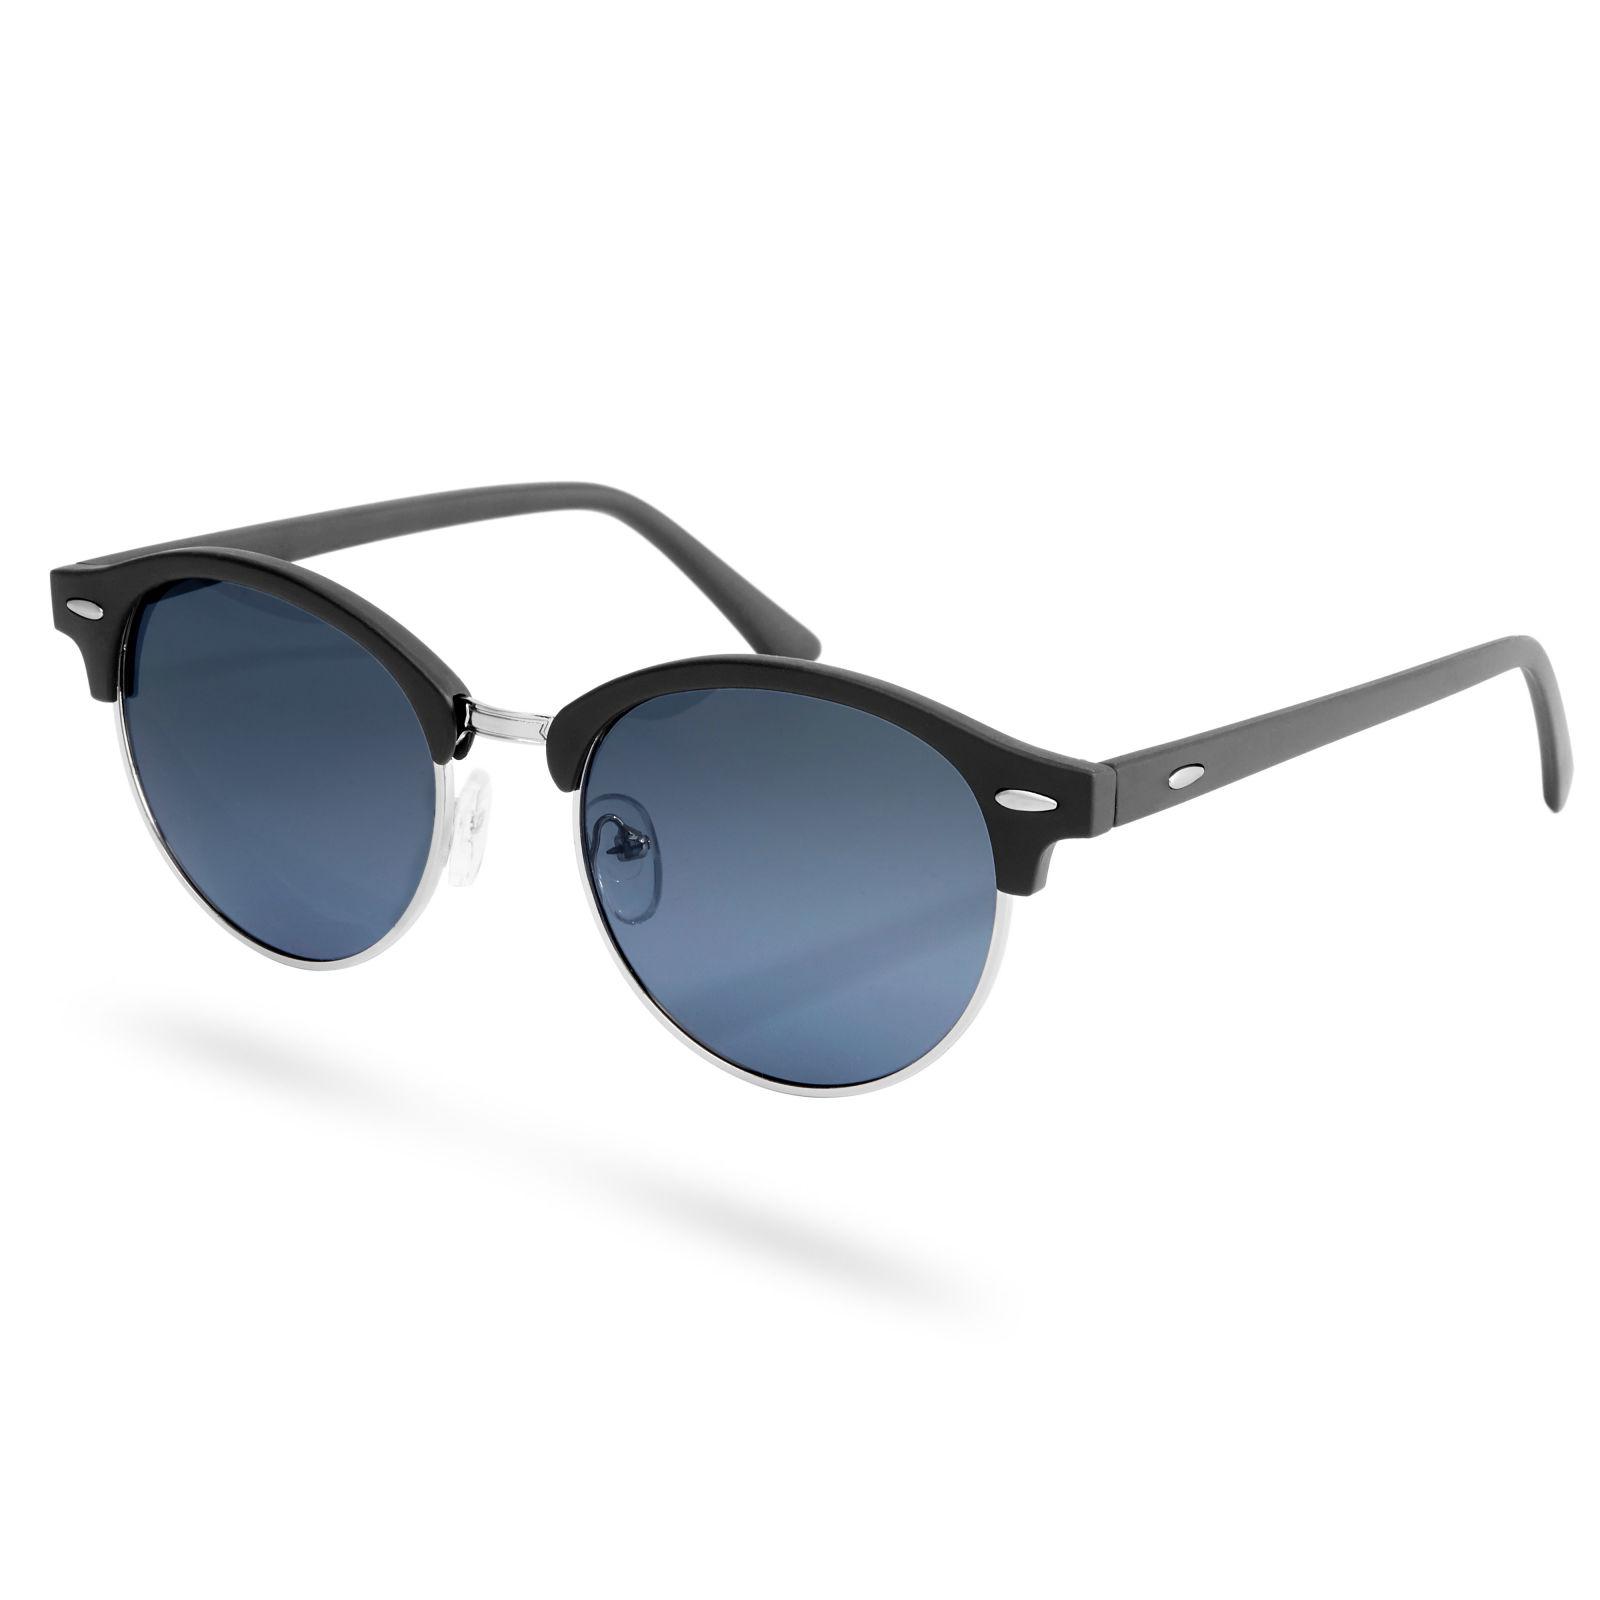 All Black Smoke Polarized Sunglasses Trendhim meILNYeaCf